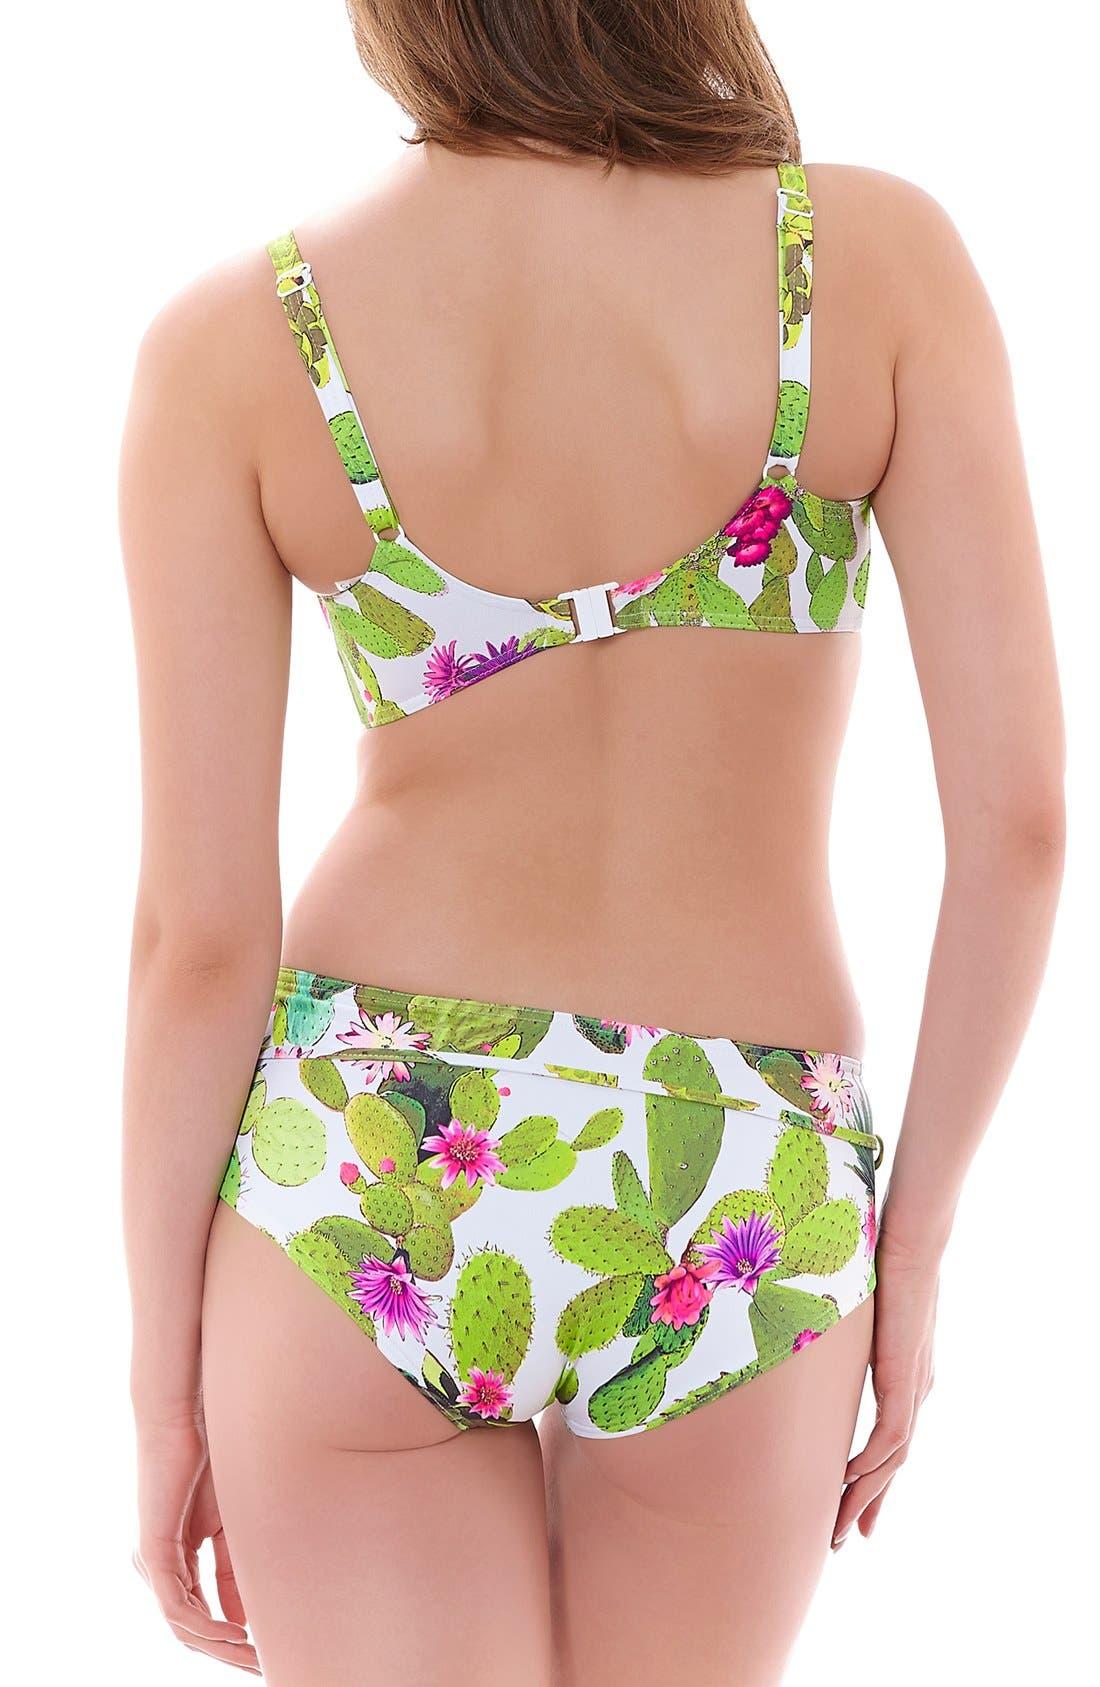 'Cactus' Underwire Bikini Top,                             Alternate thumbnail 5, color,                             348